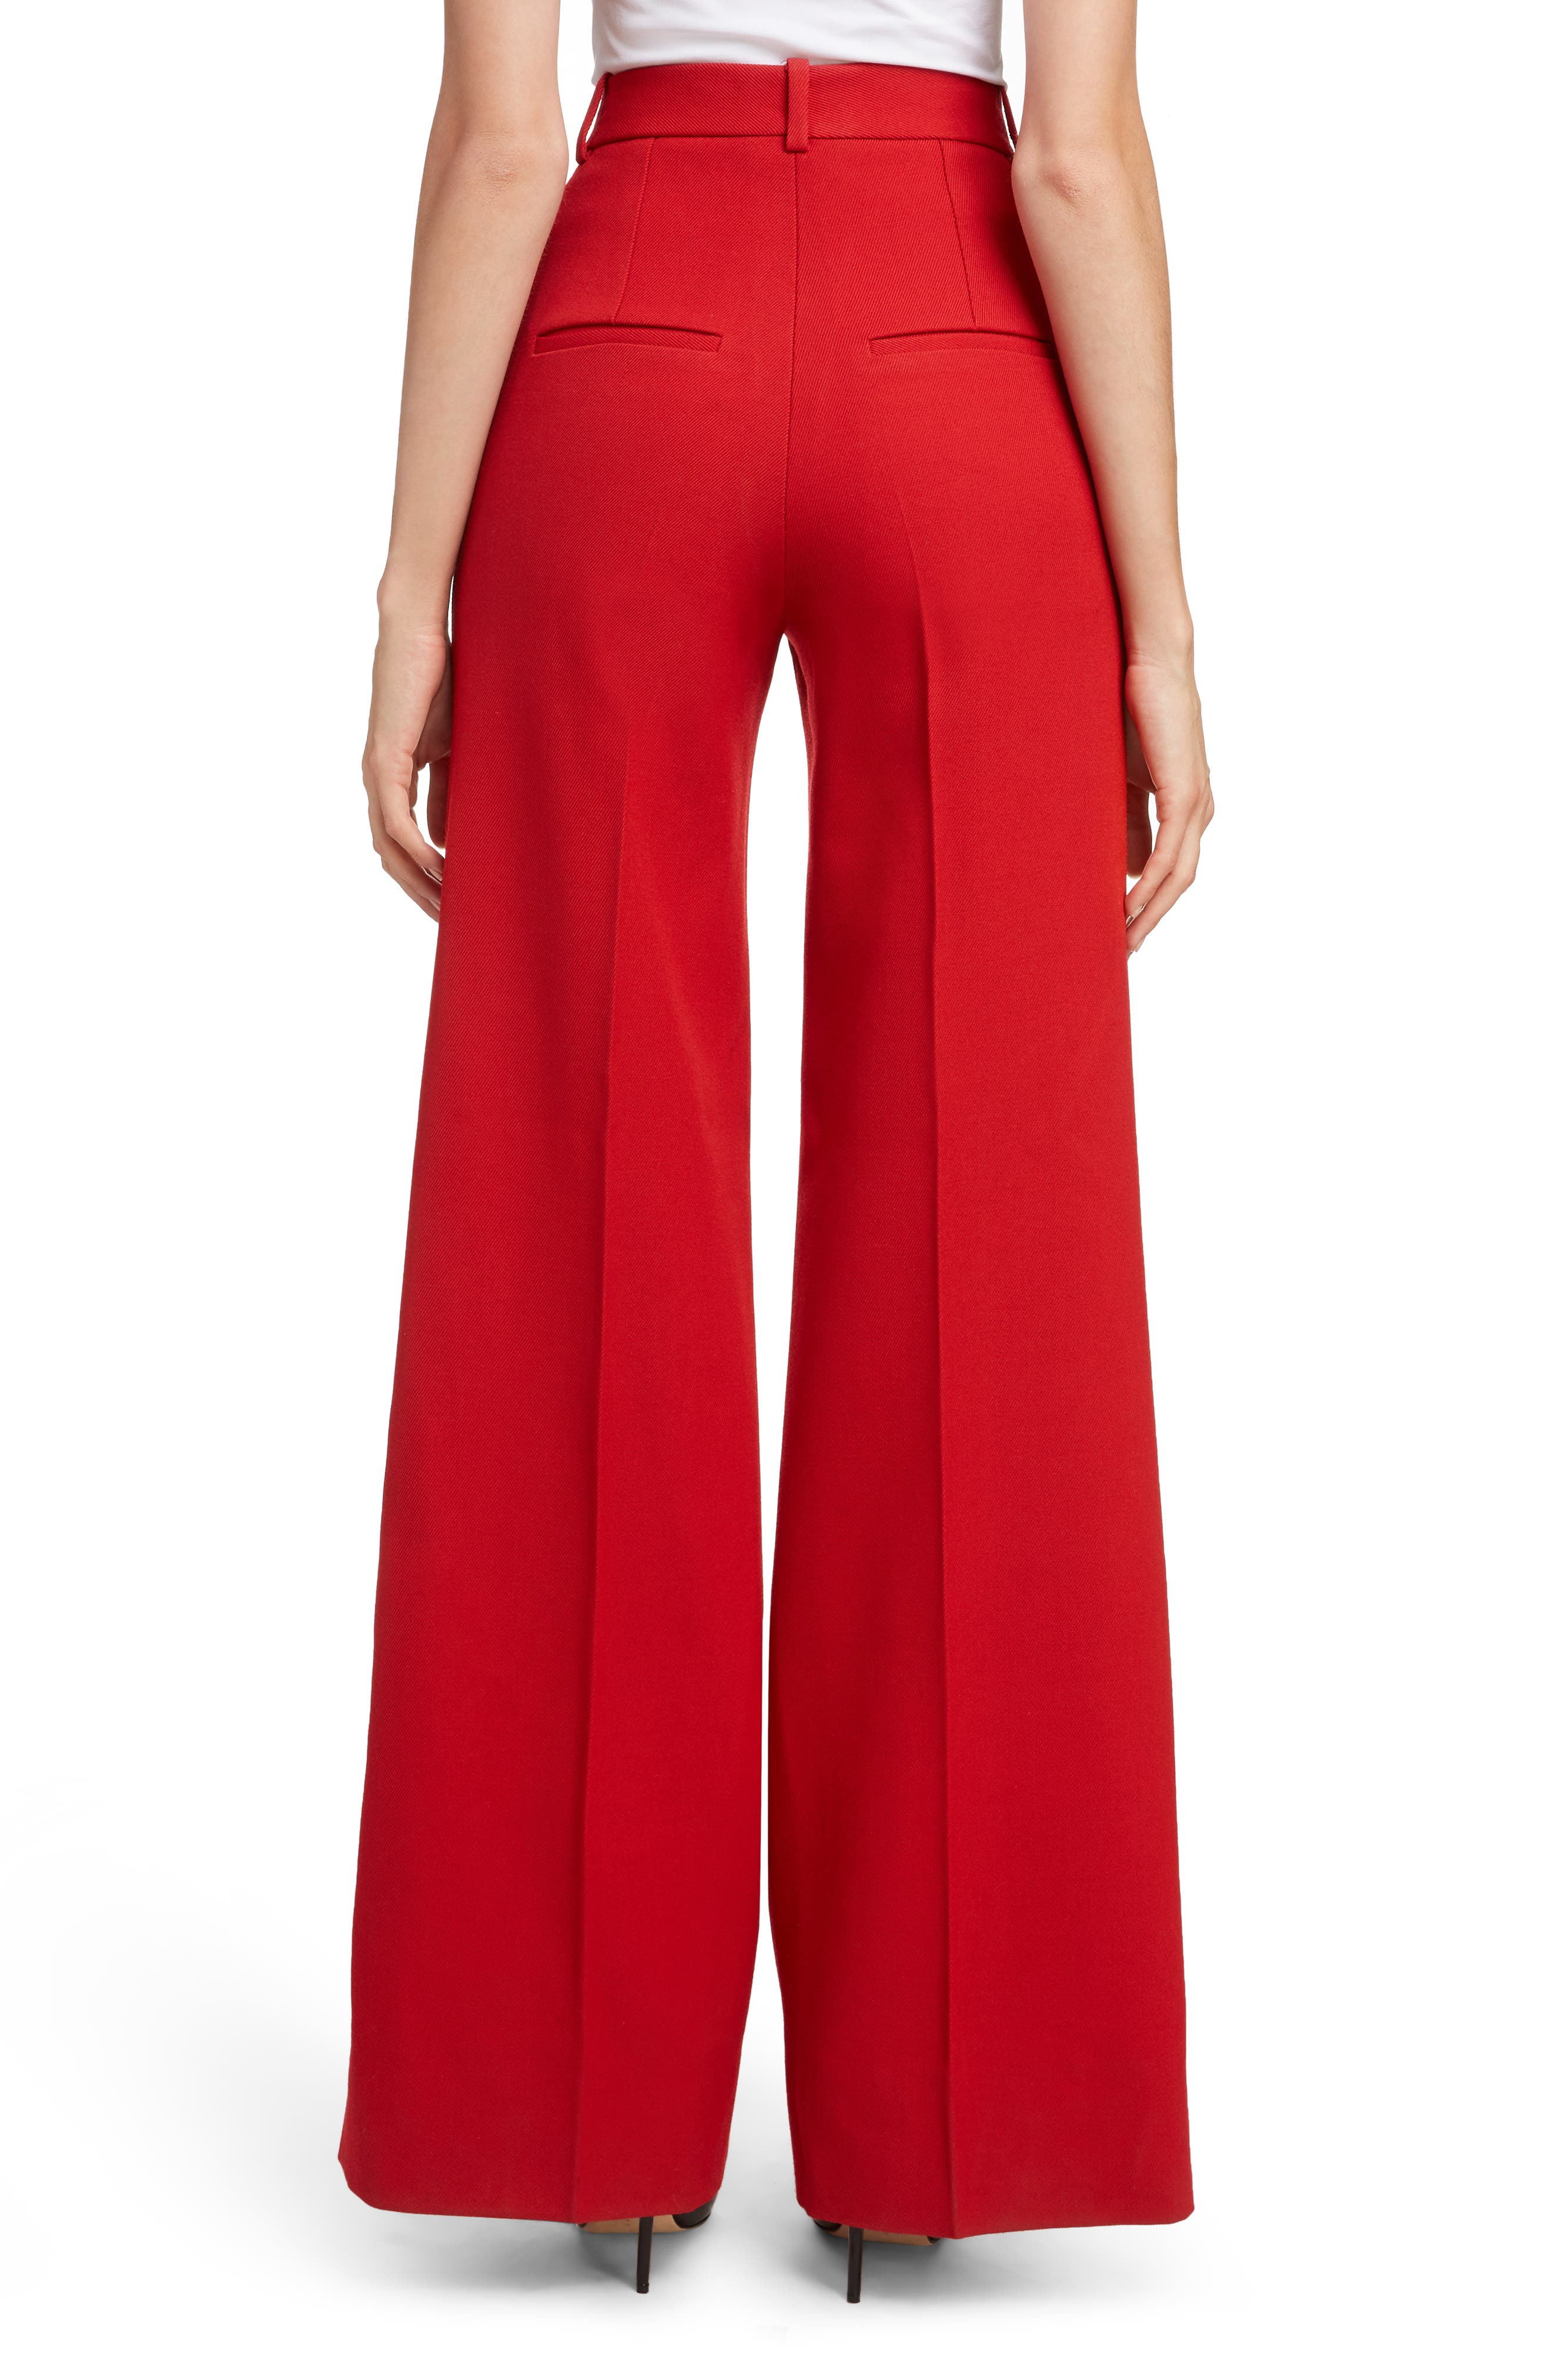 VICTORIA BECKHAM, High Waist Wool Pants, Alternate thumbnail 2, color, RED